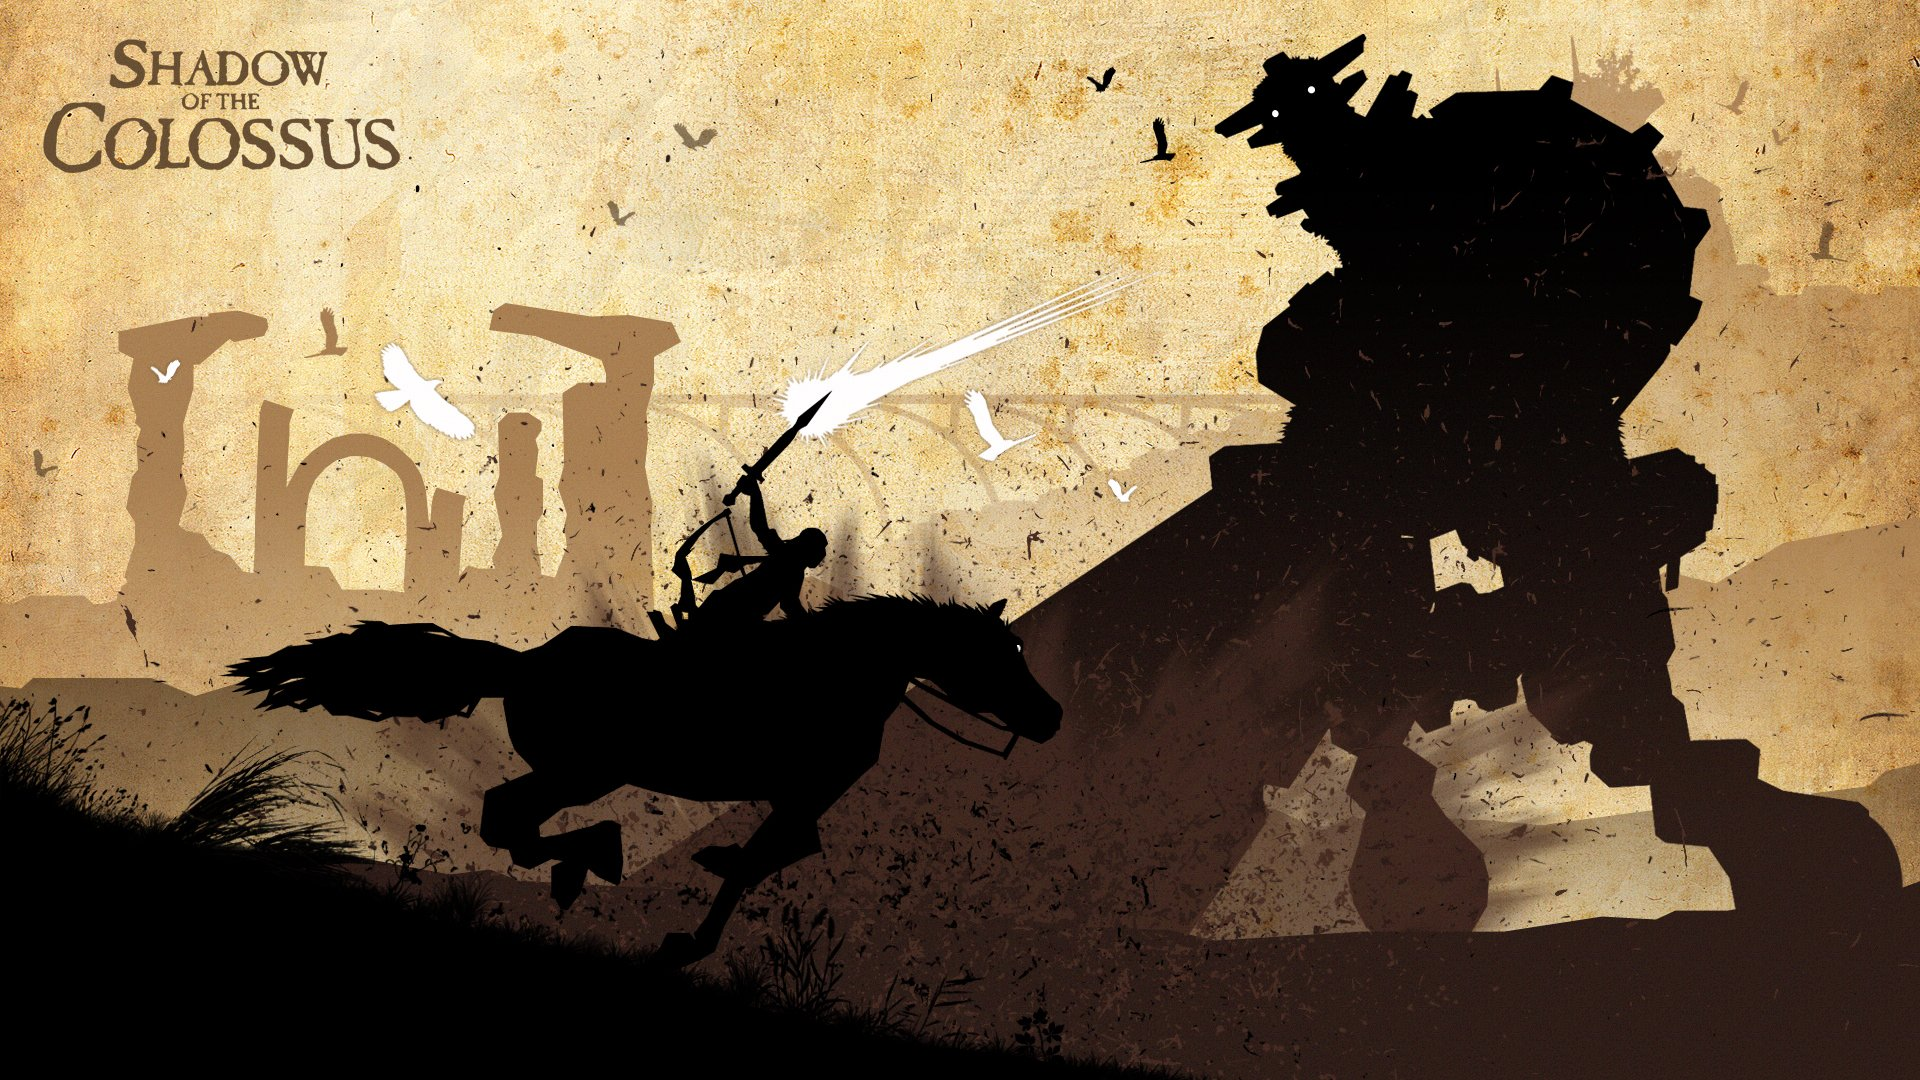 Игра. Легенда. История. Шедевр - Shadow of the Colossus! - Изображение 1